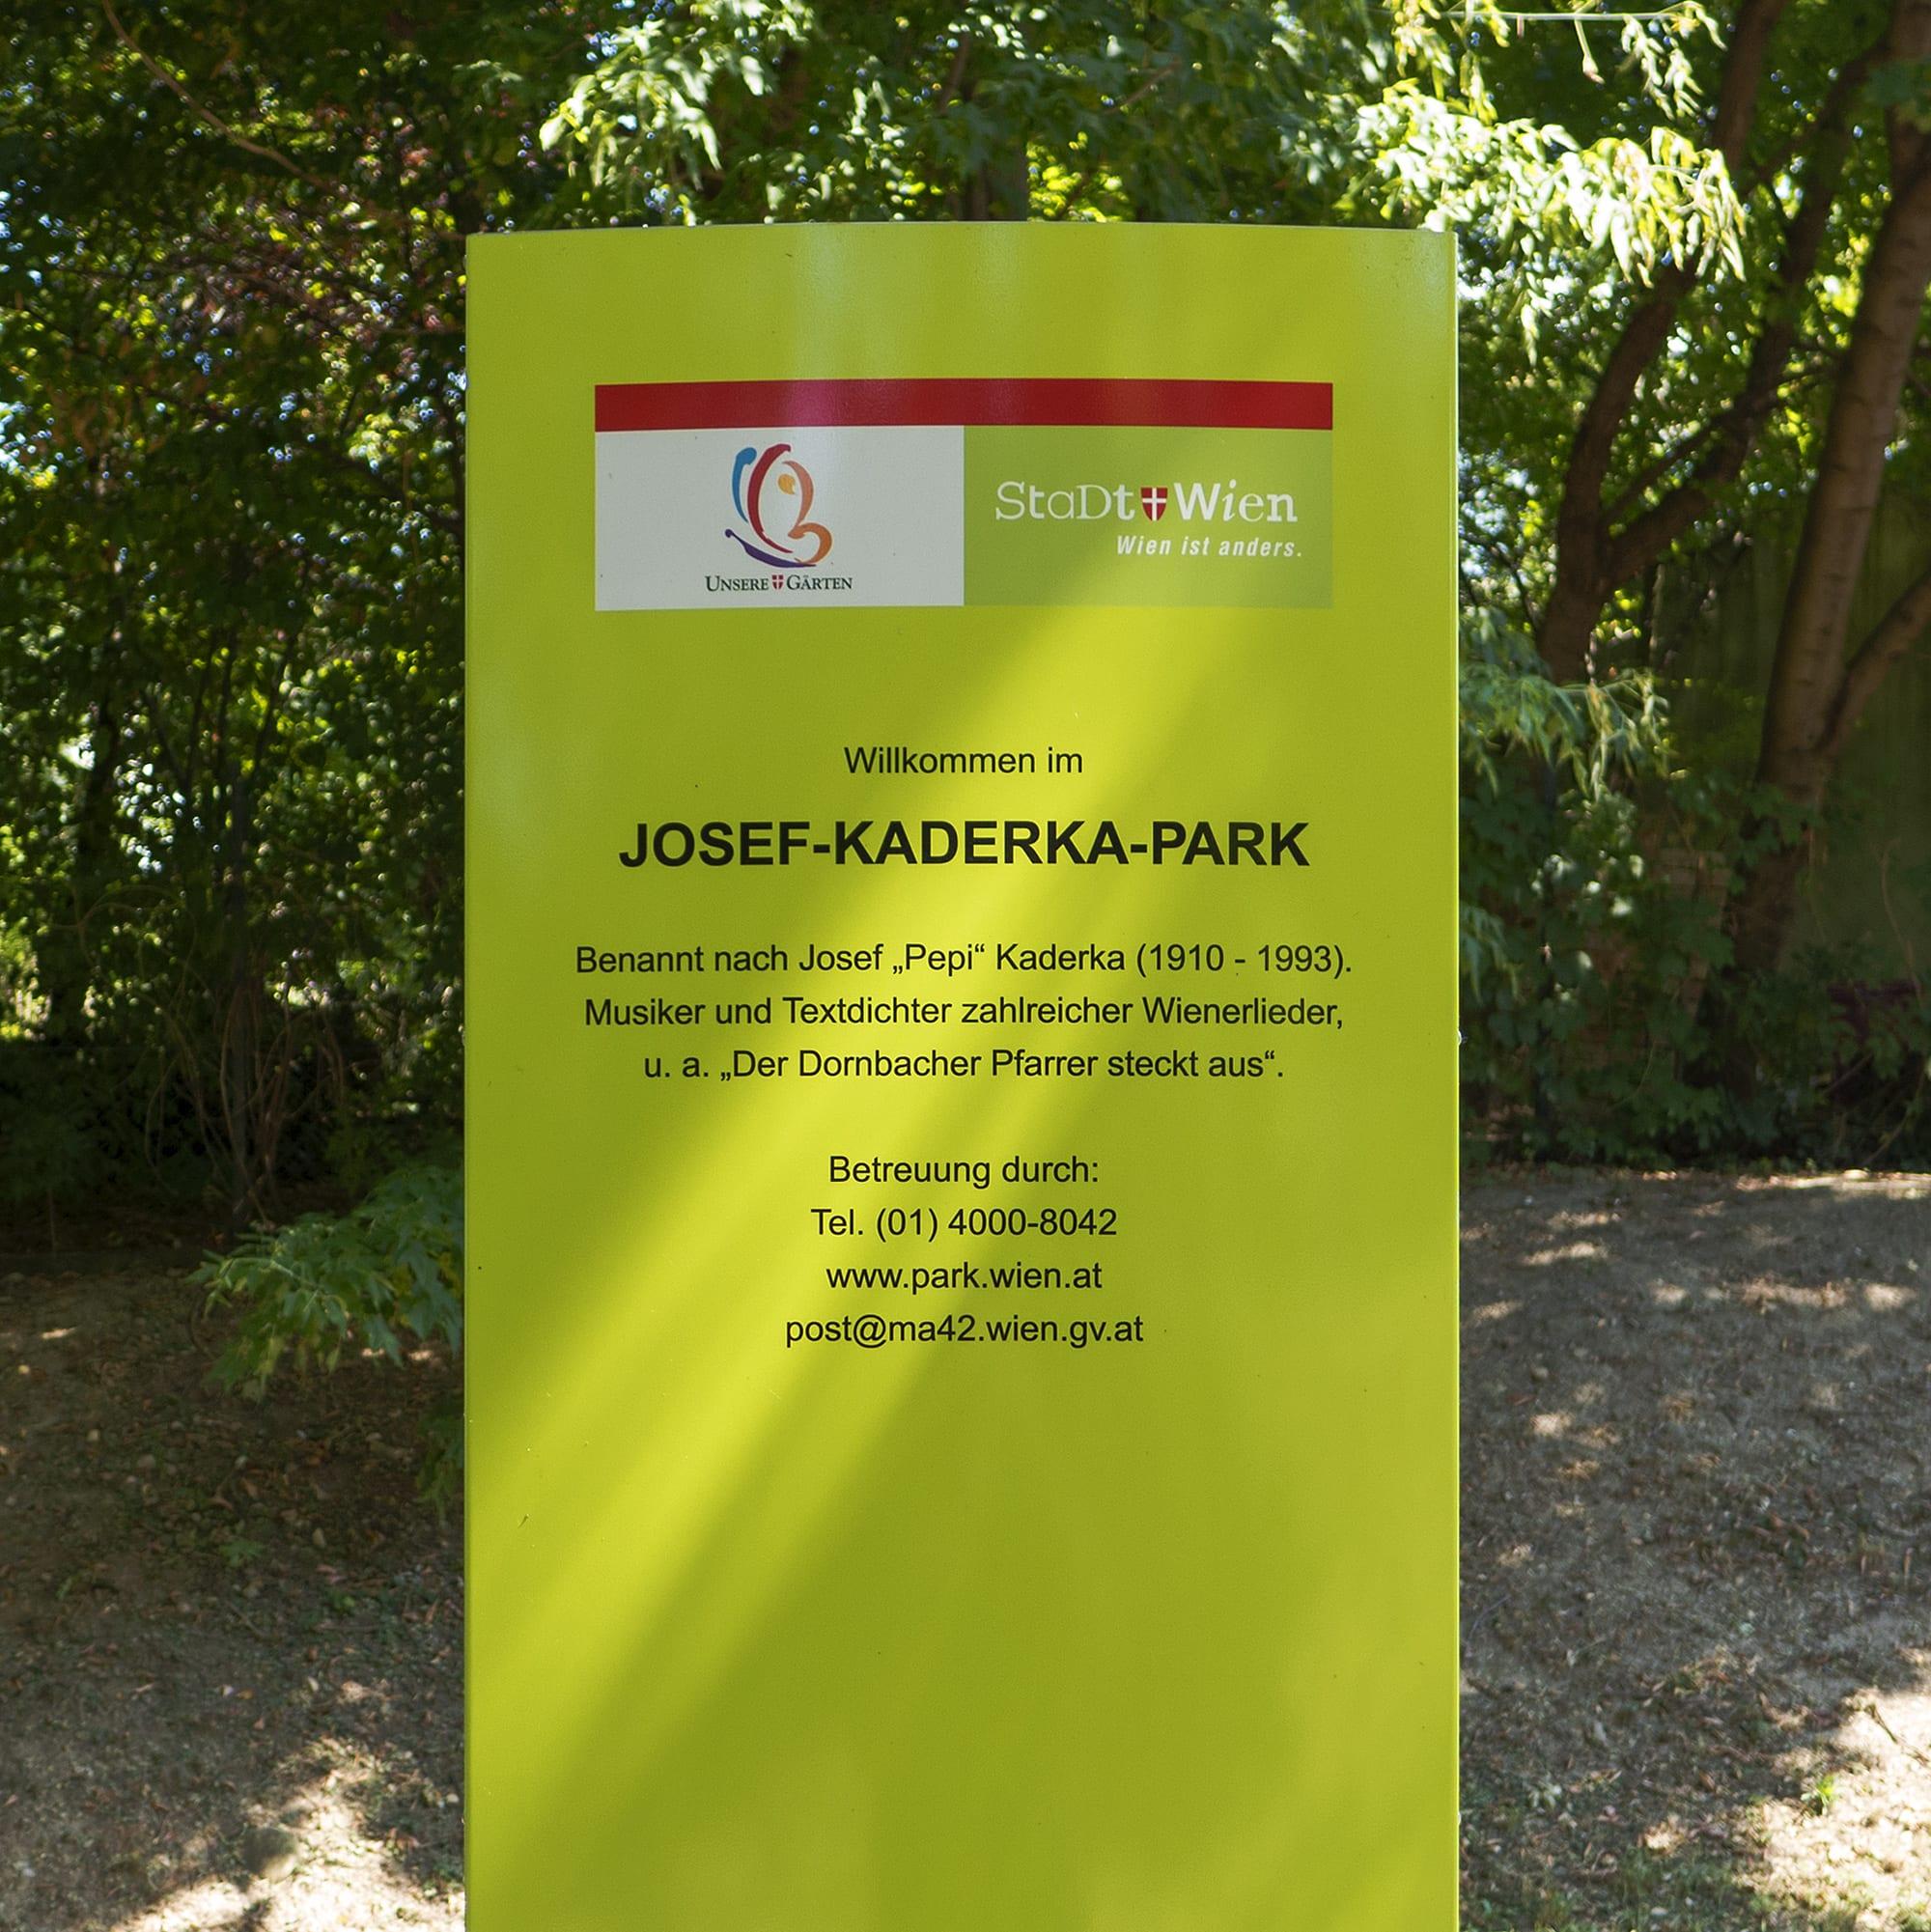 Josef Kaderka Park